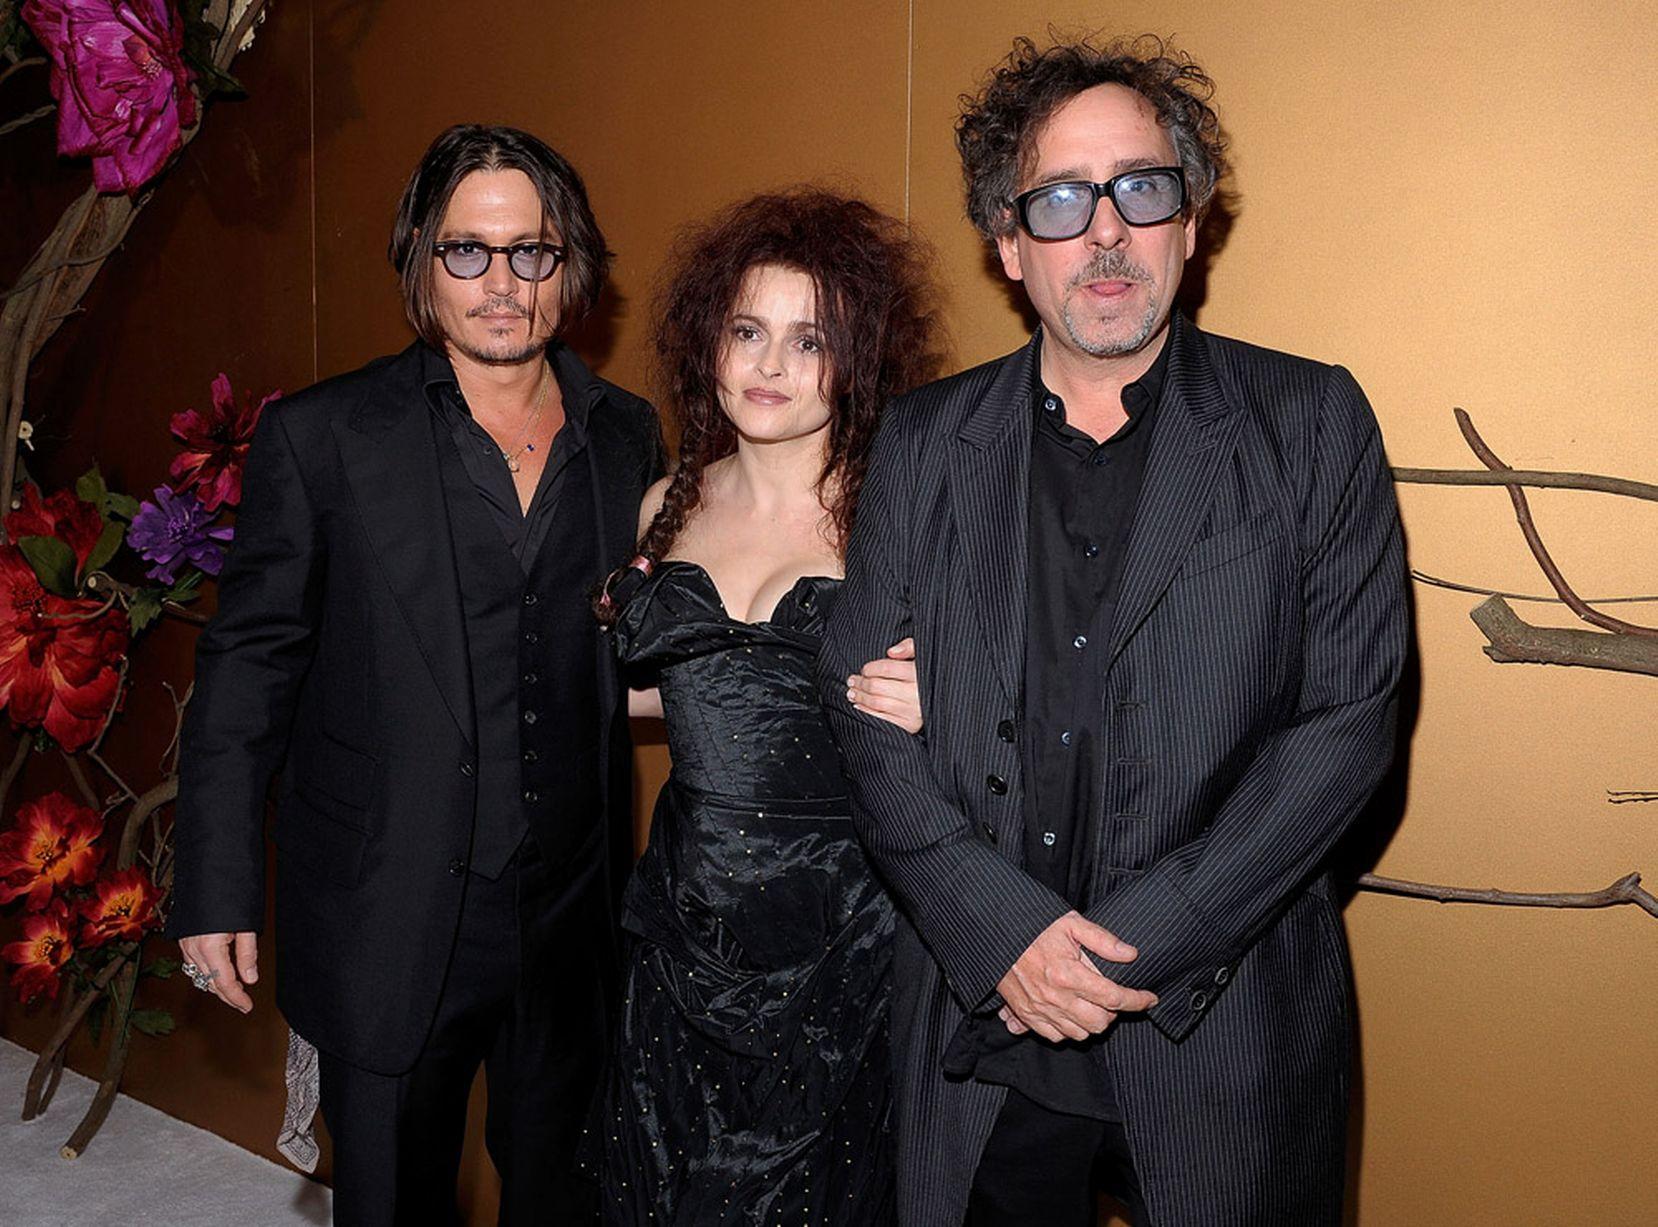 Johnny-Depp-Helena-Bonham-Carter-November-17-2009